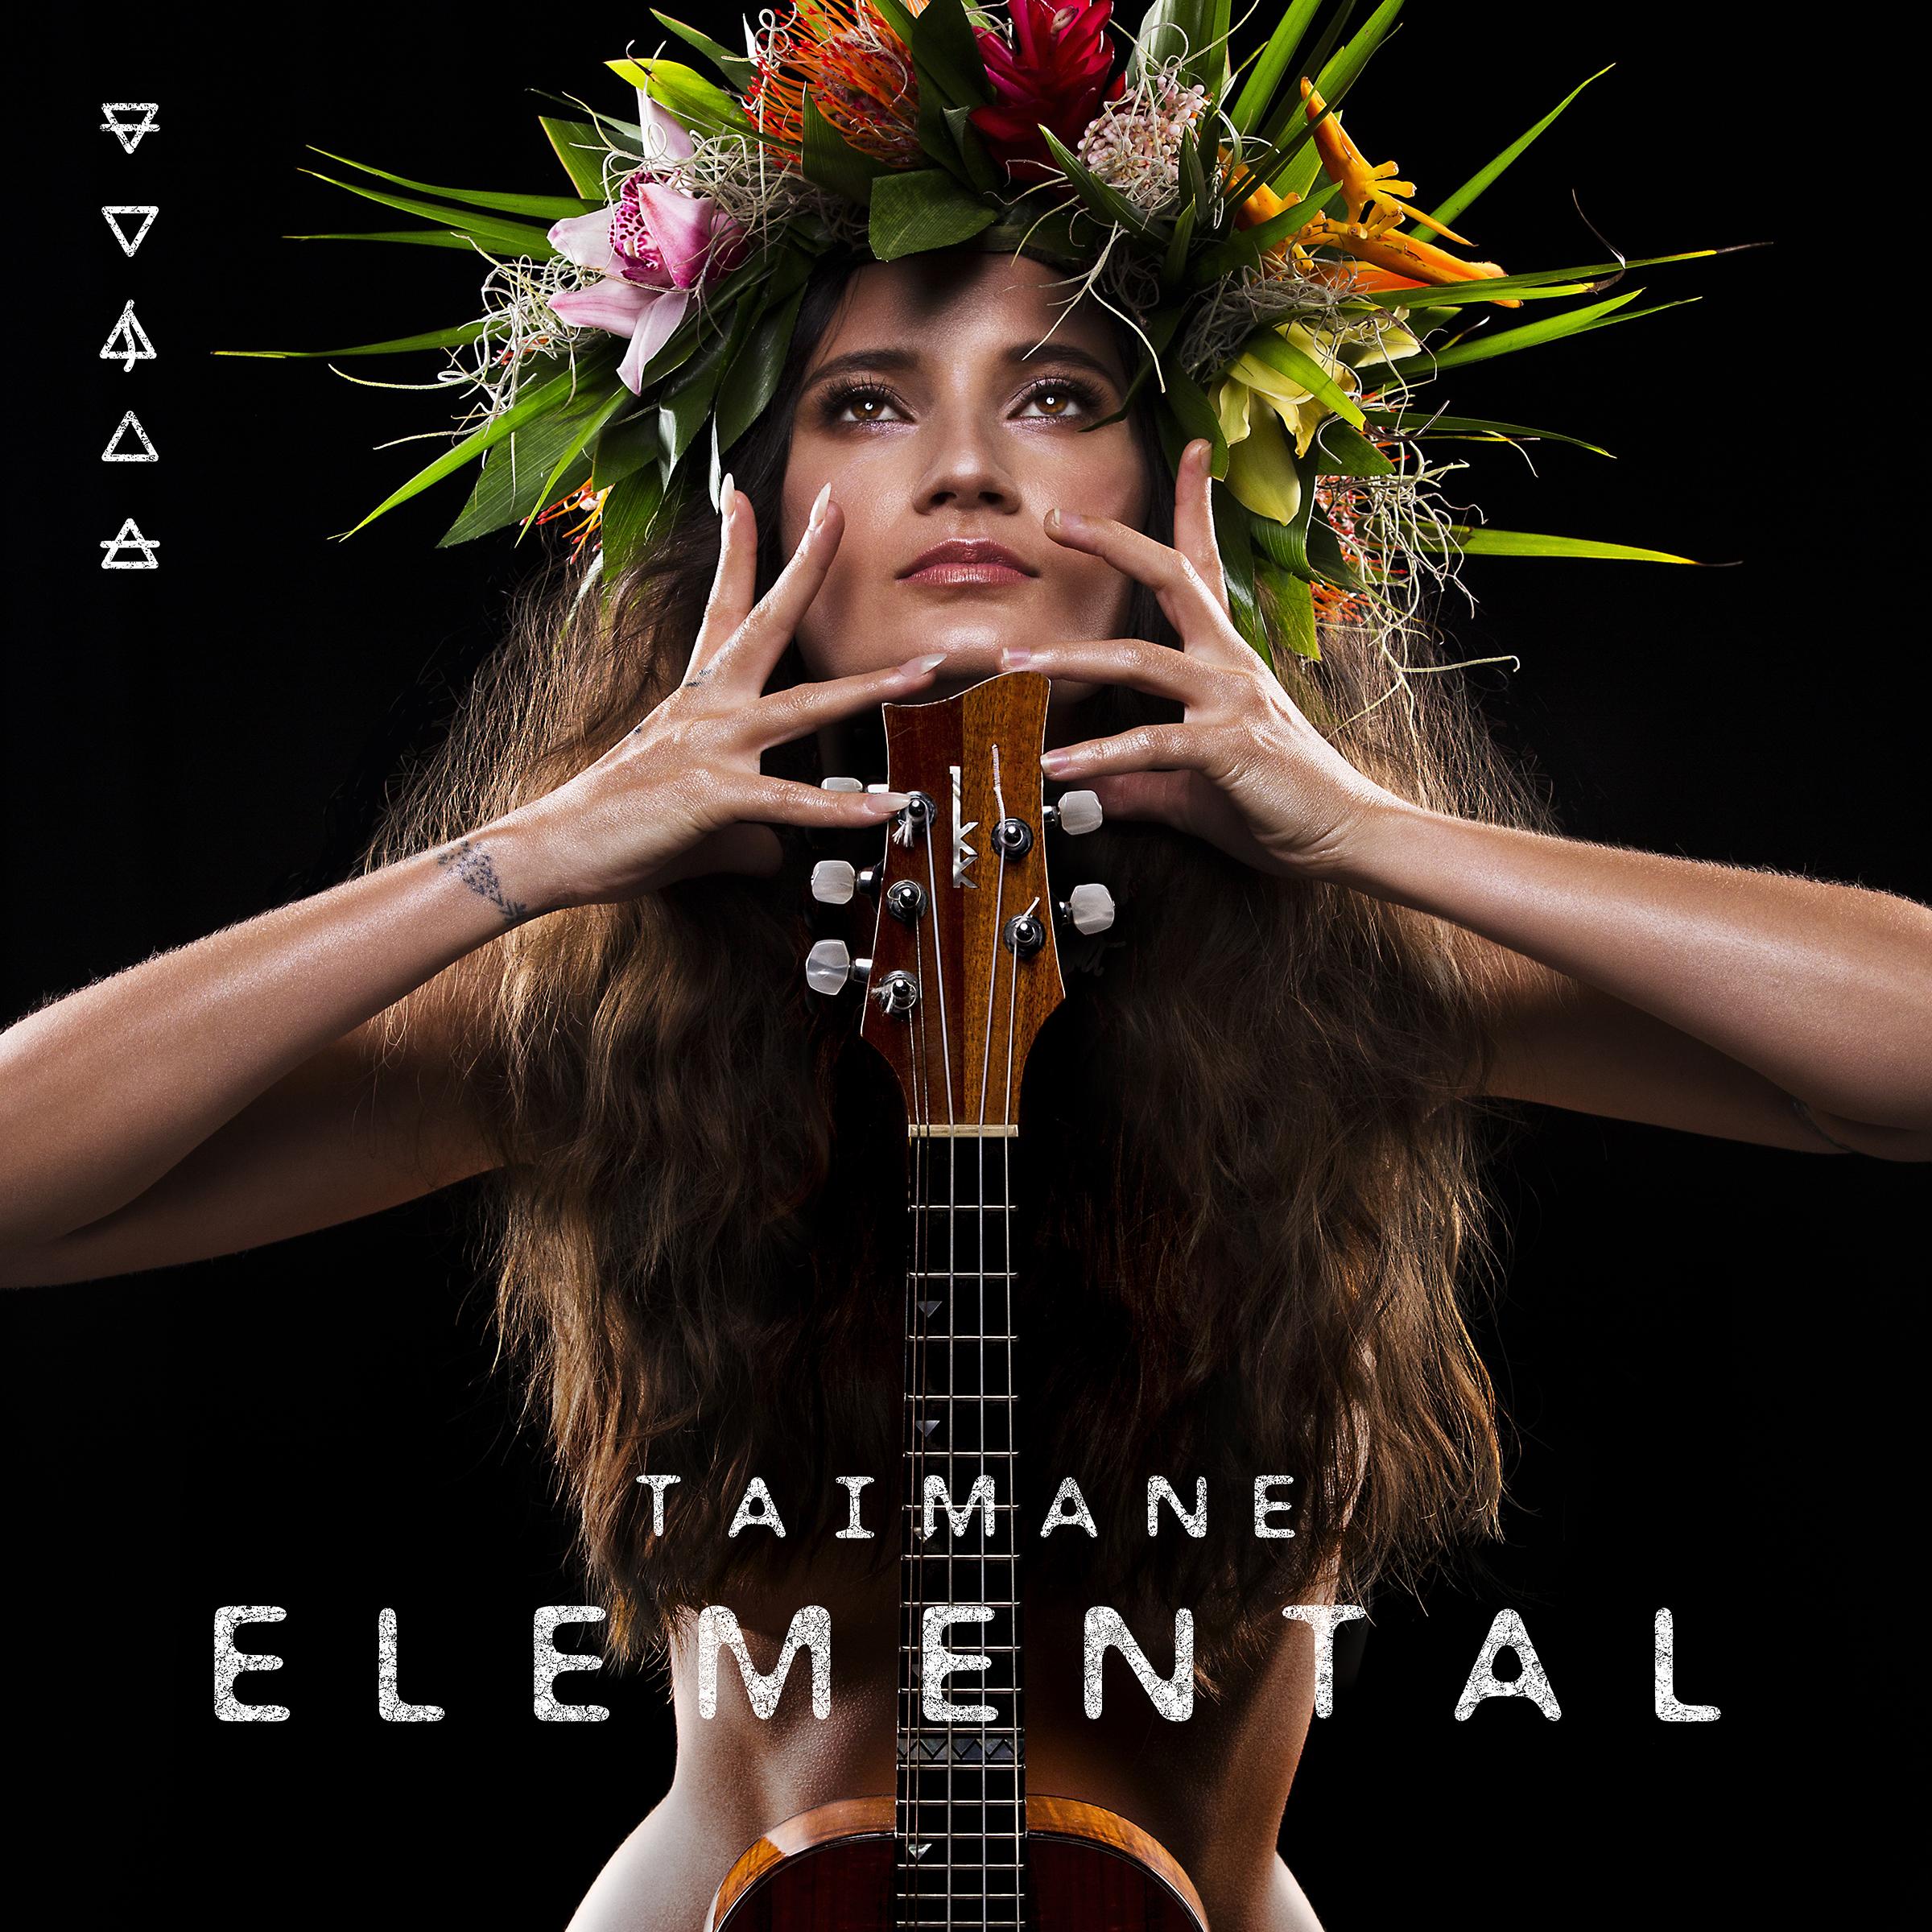 Elemental - Album Cover - SquareSpace_2400X2400.jpg